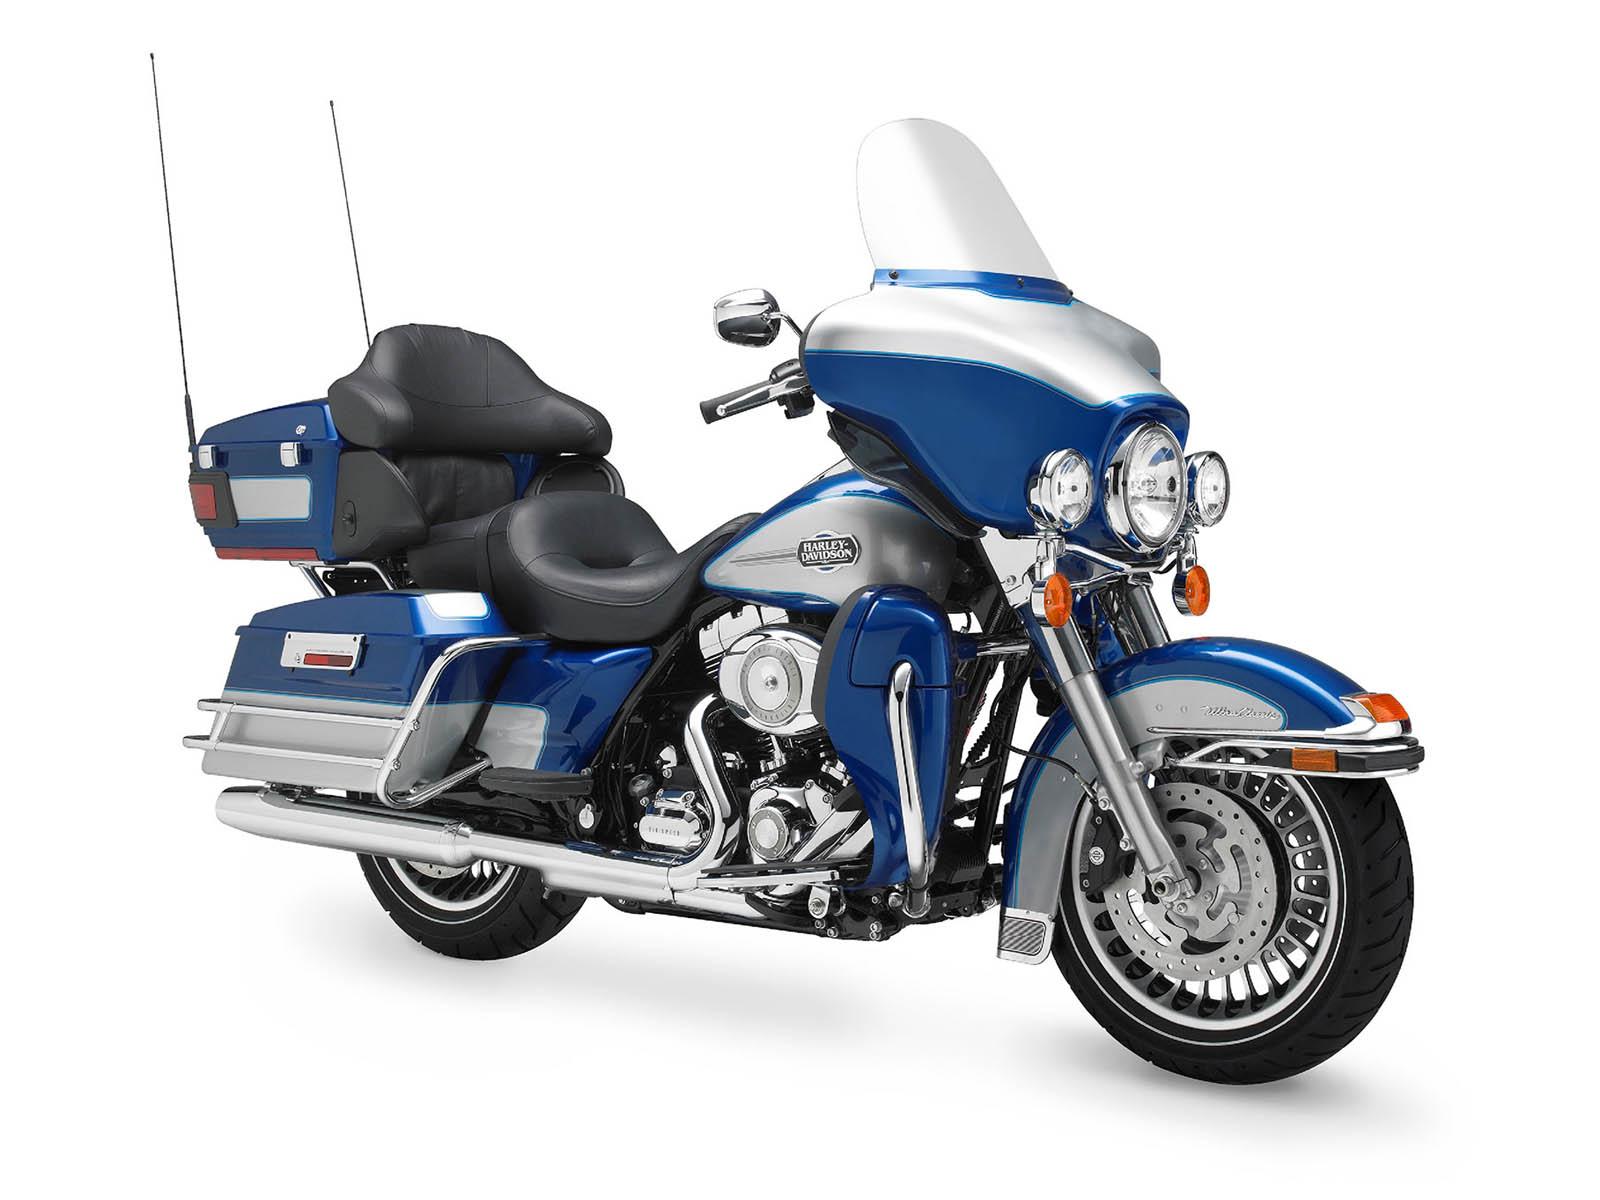 Harley Davidson Ultra Classic Electra Glide FLHTCU Bike Wallpapers 1600x1200